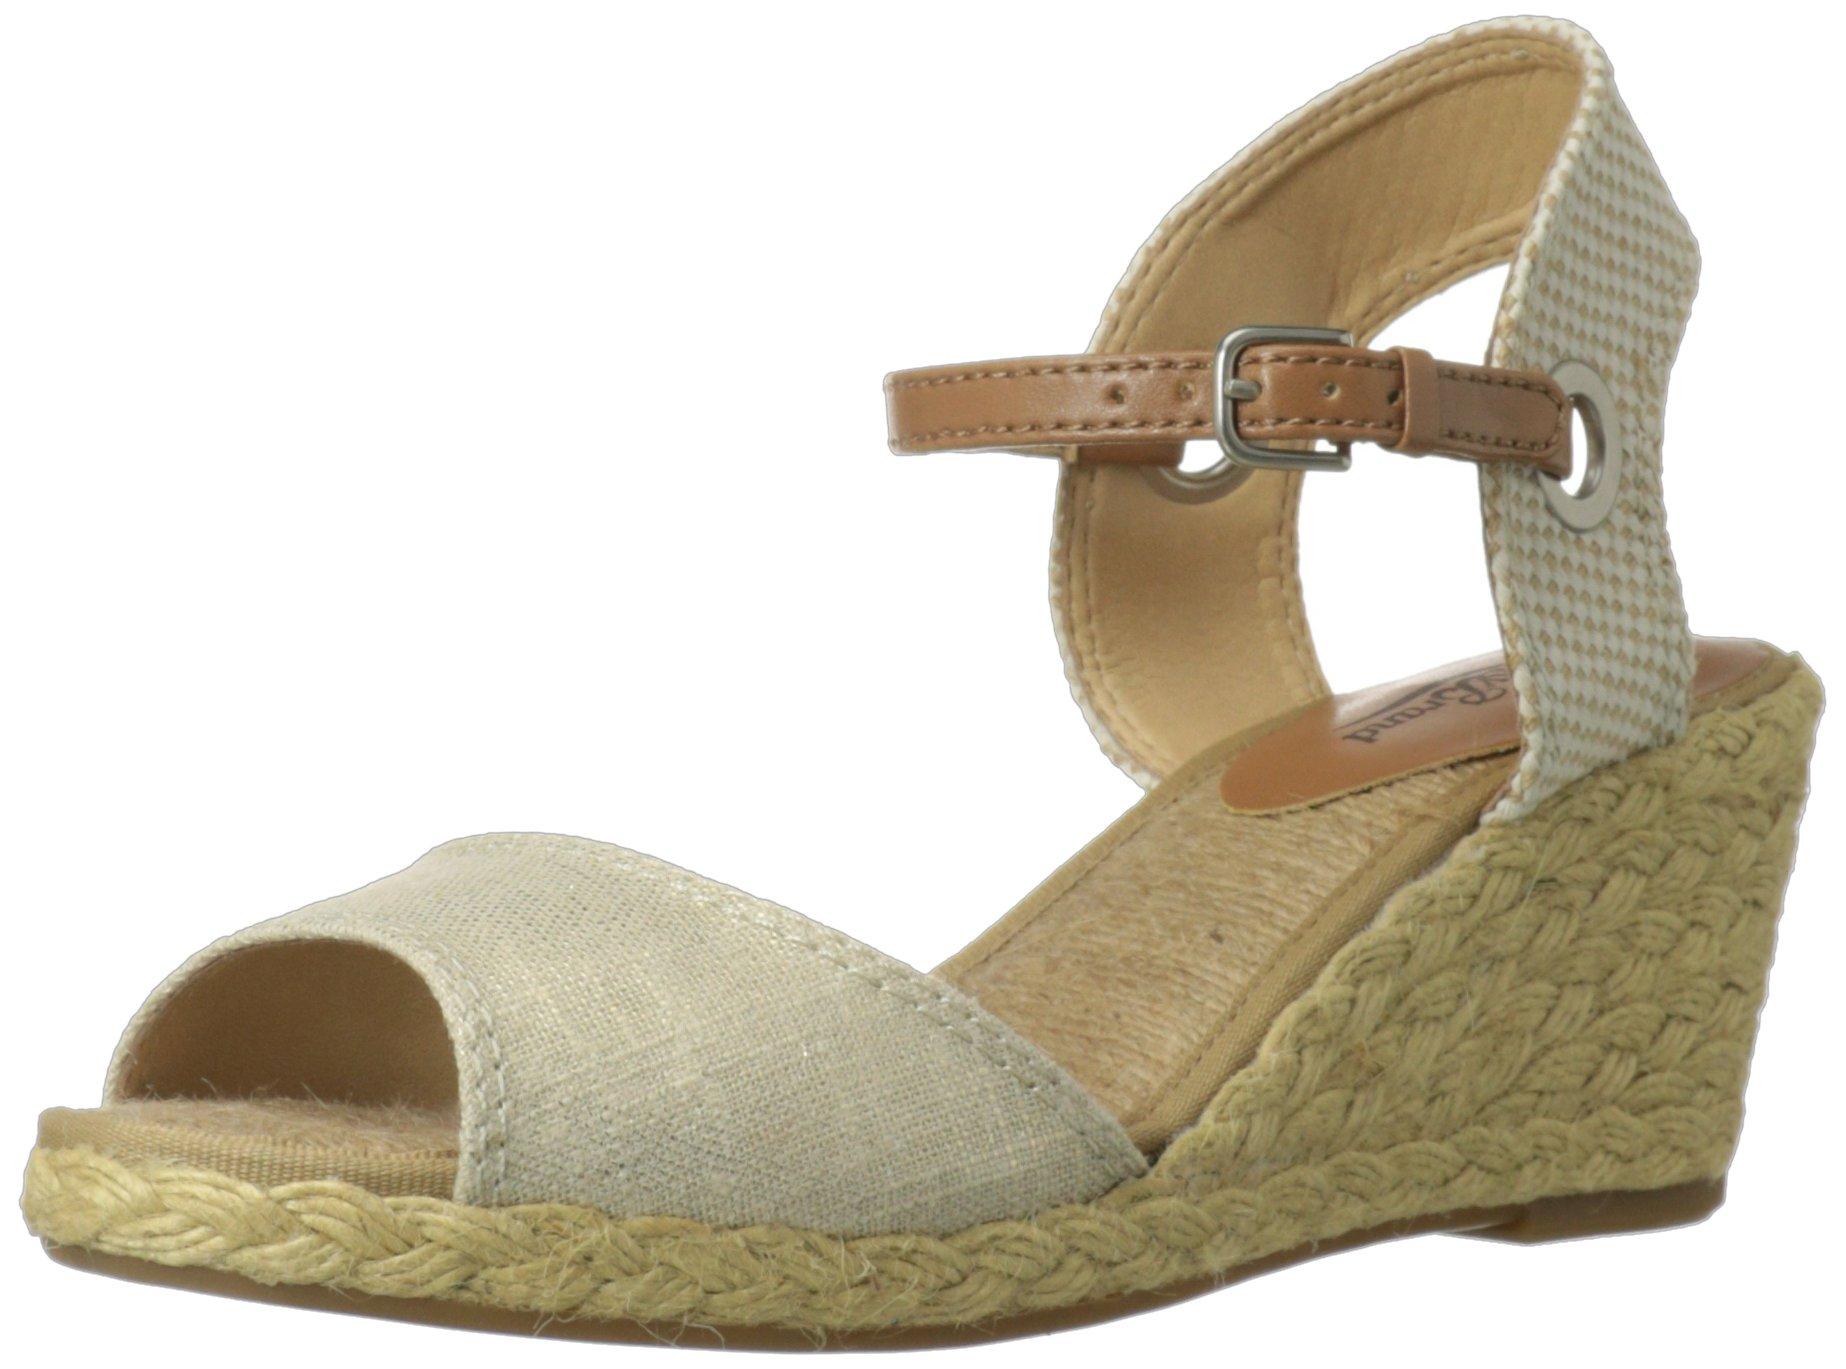 Lucky Brand Women's Kyndra Wedge Sandal,Natural/Platinum Metallic,8.5 M US